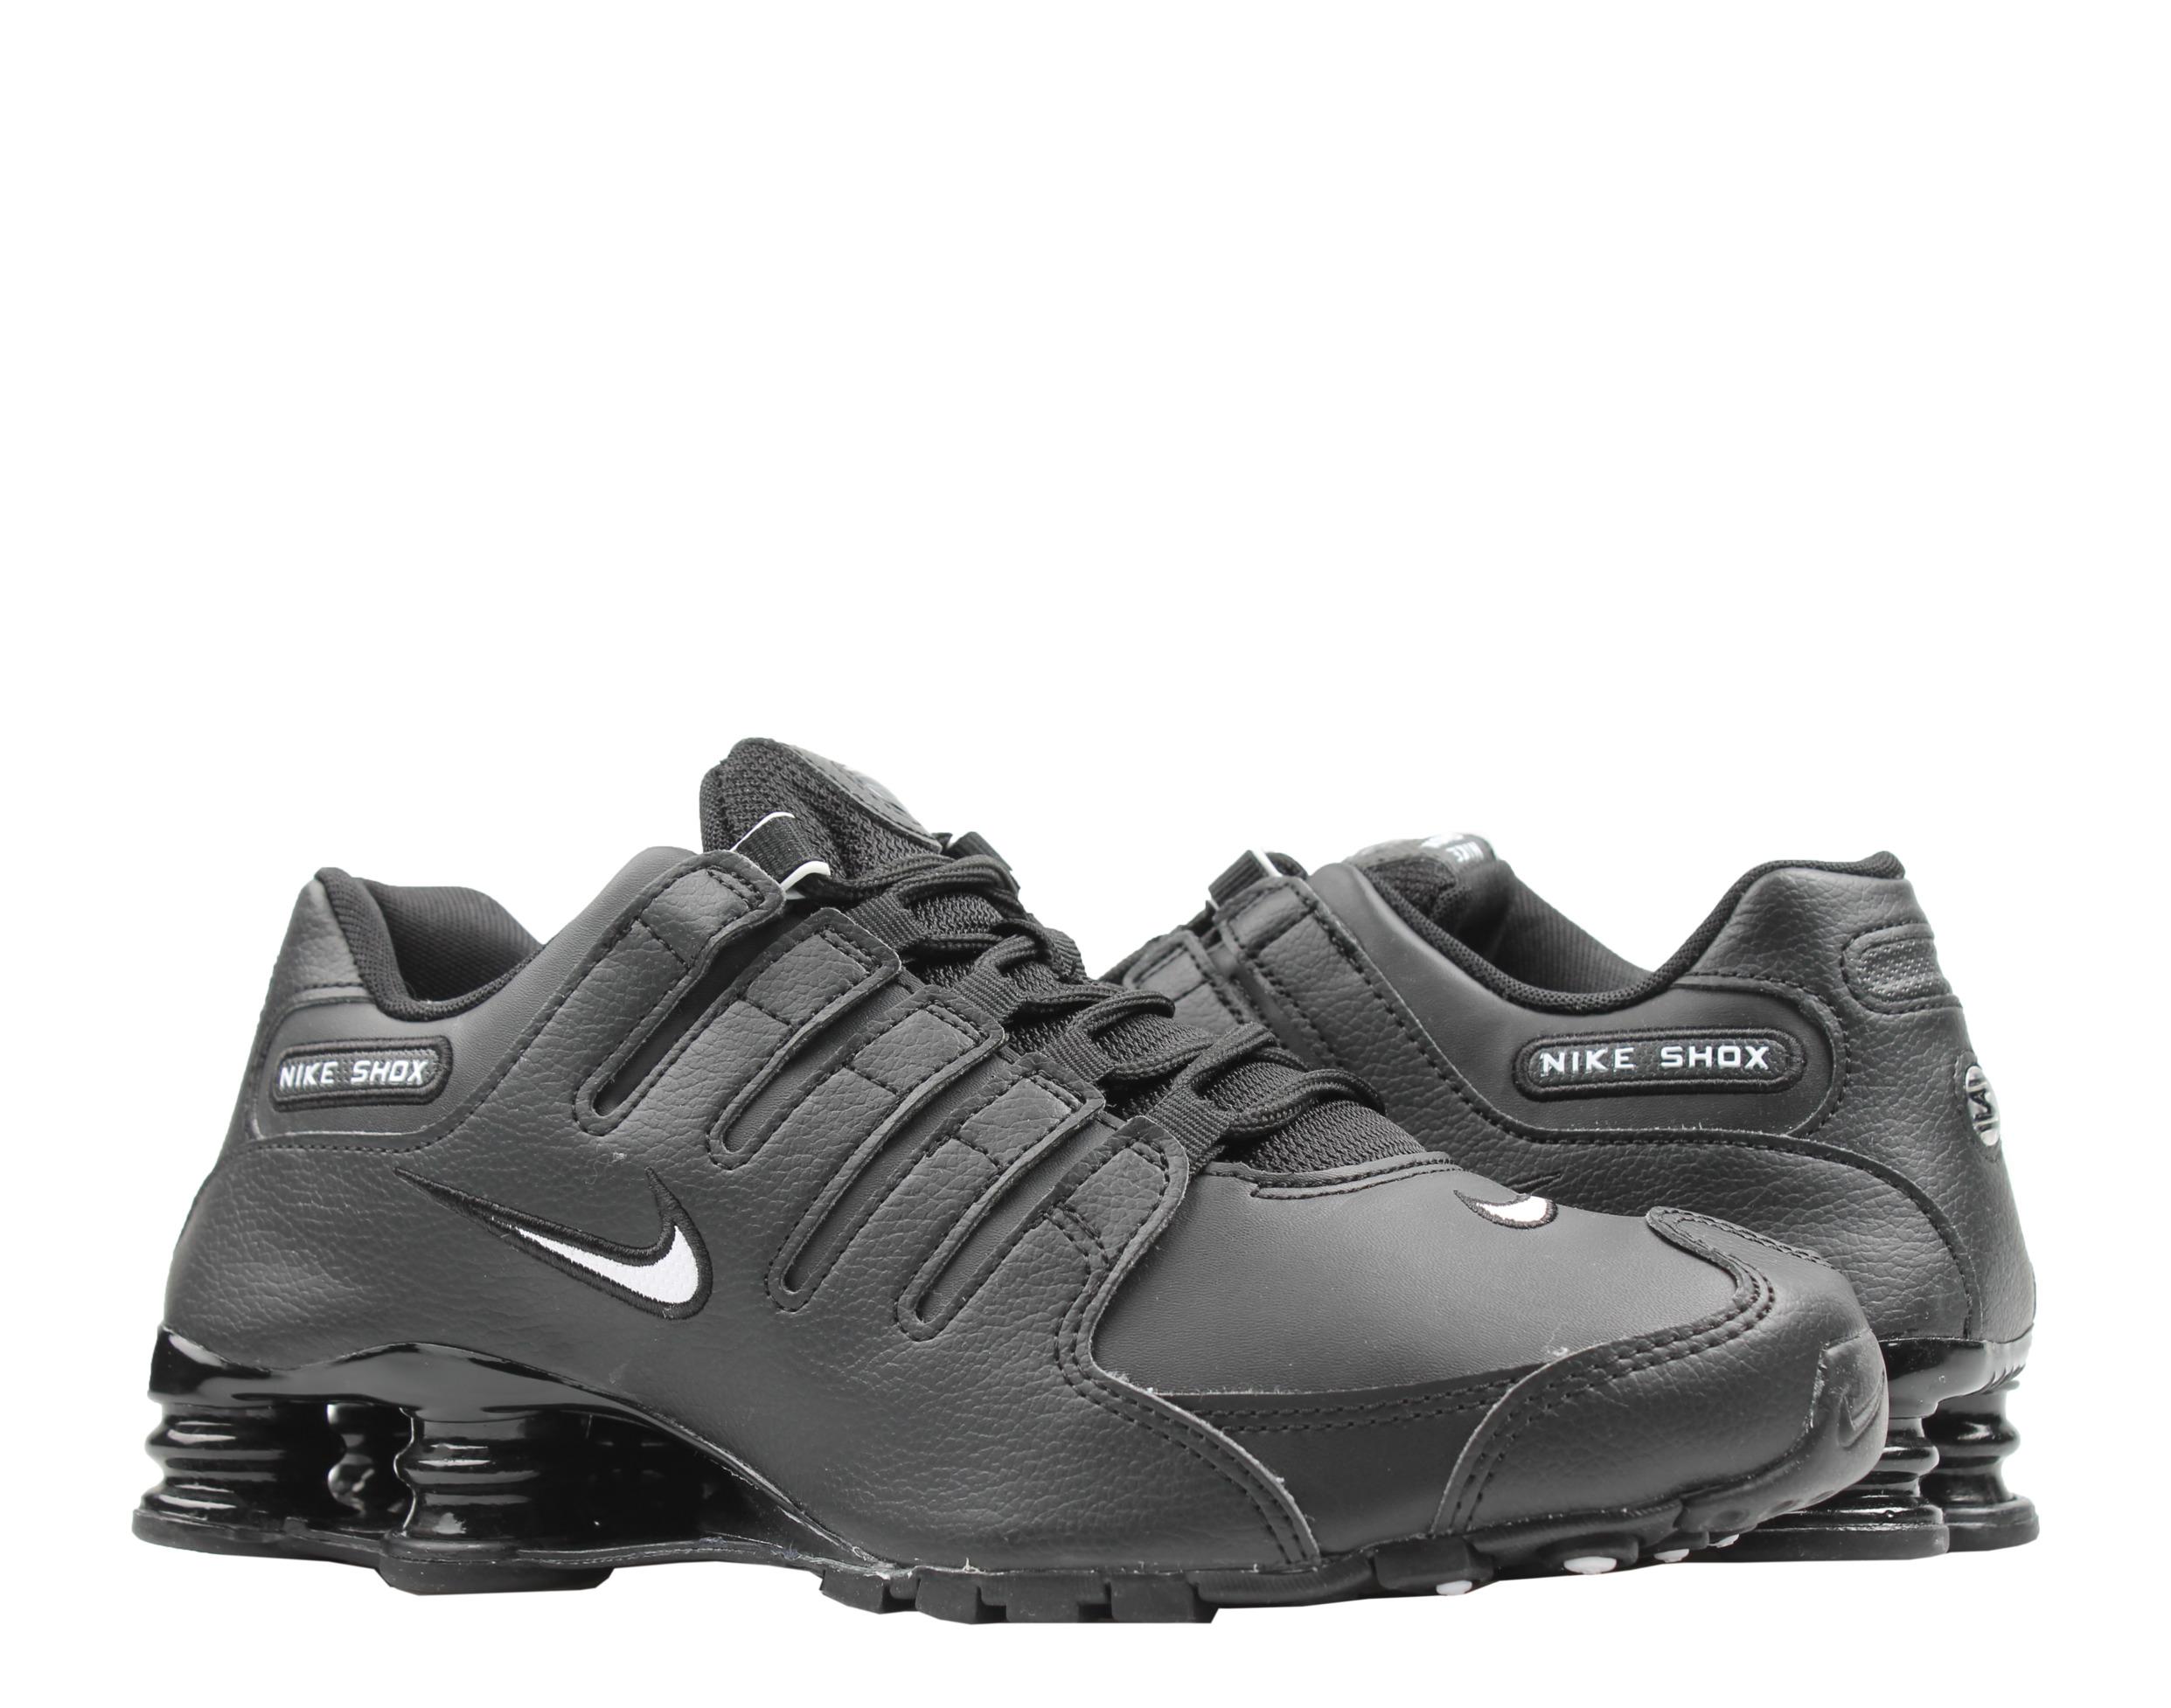 Nike Shox NZ EU Mens Running Shoes Black//White//Black 501524-091 NWB All Sizes